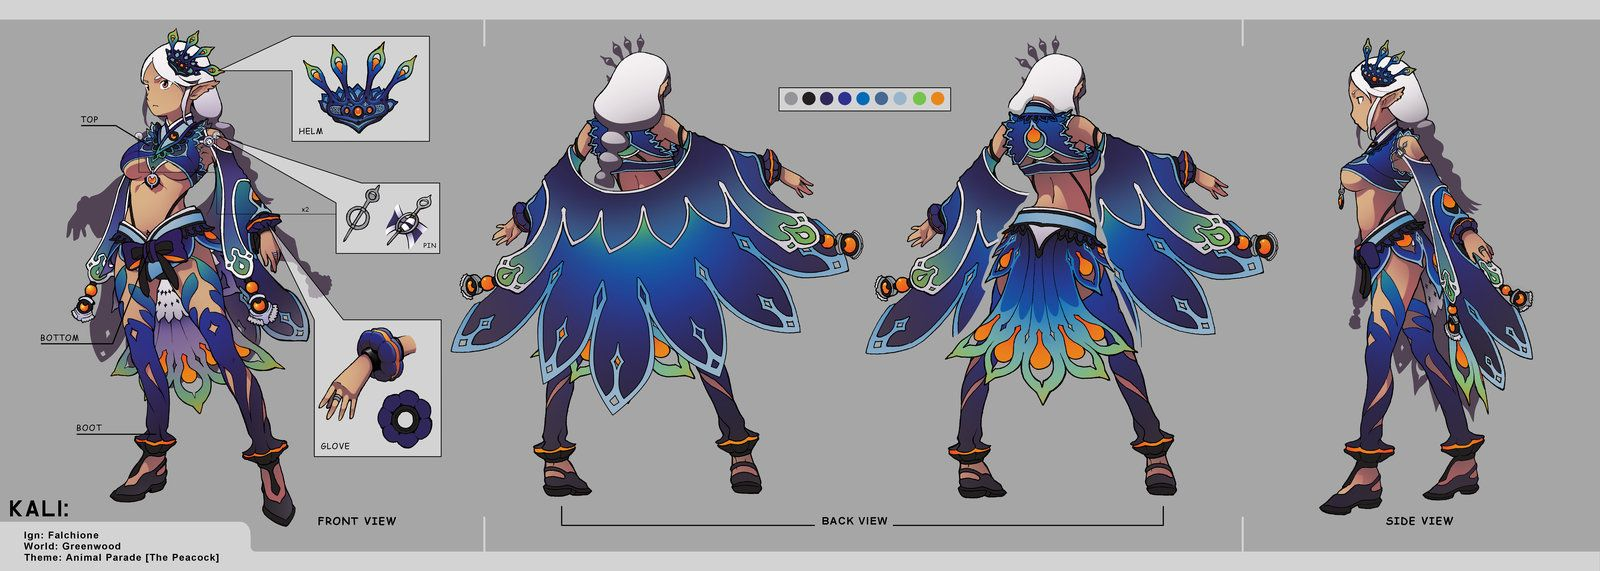 Google themes dragon nest - My Entry Costume Design For Kali Class In Dragon Nest Dragon Nest Kali Costume Set